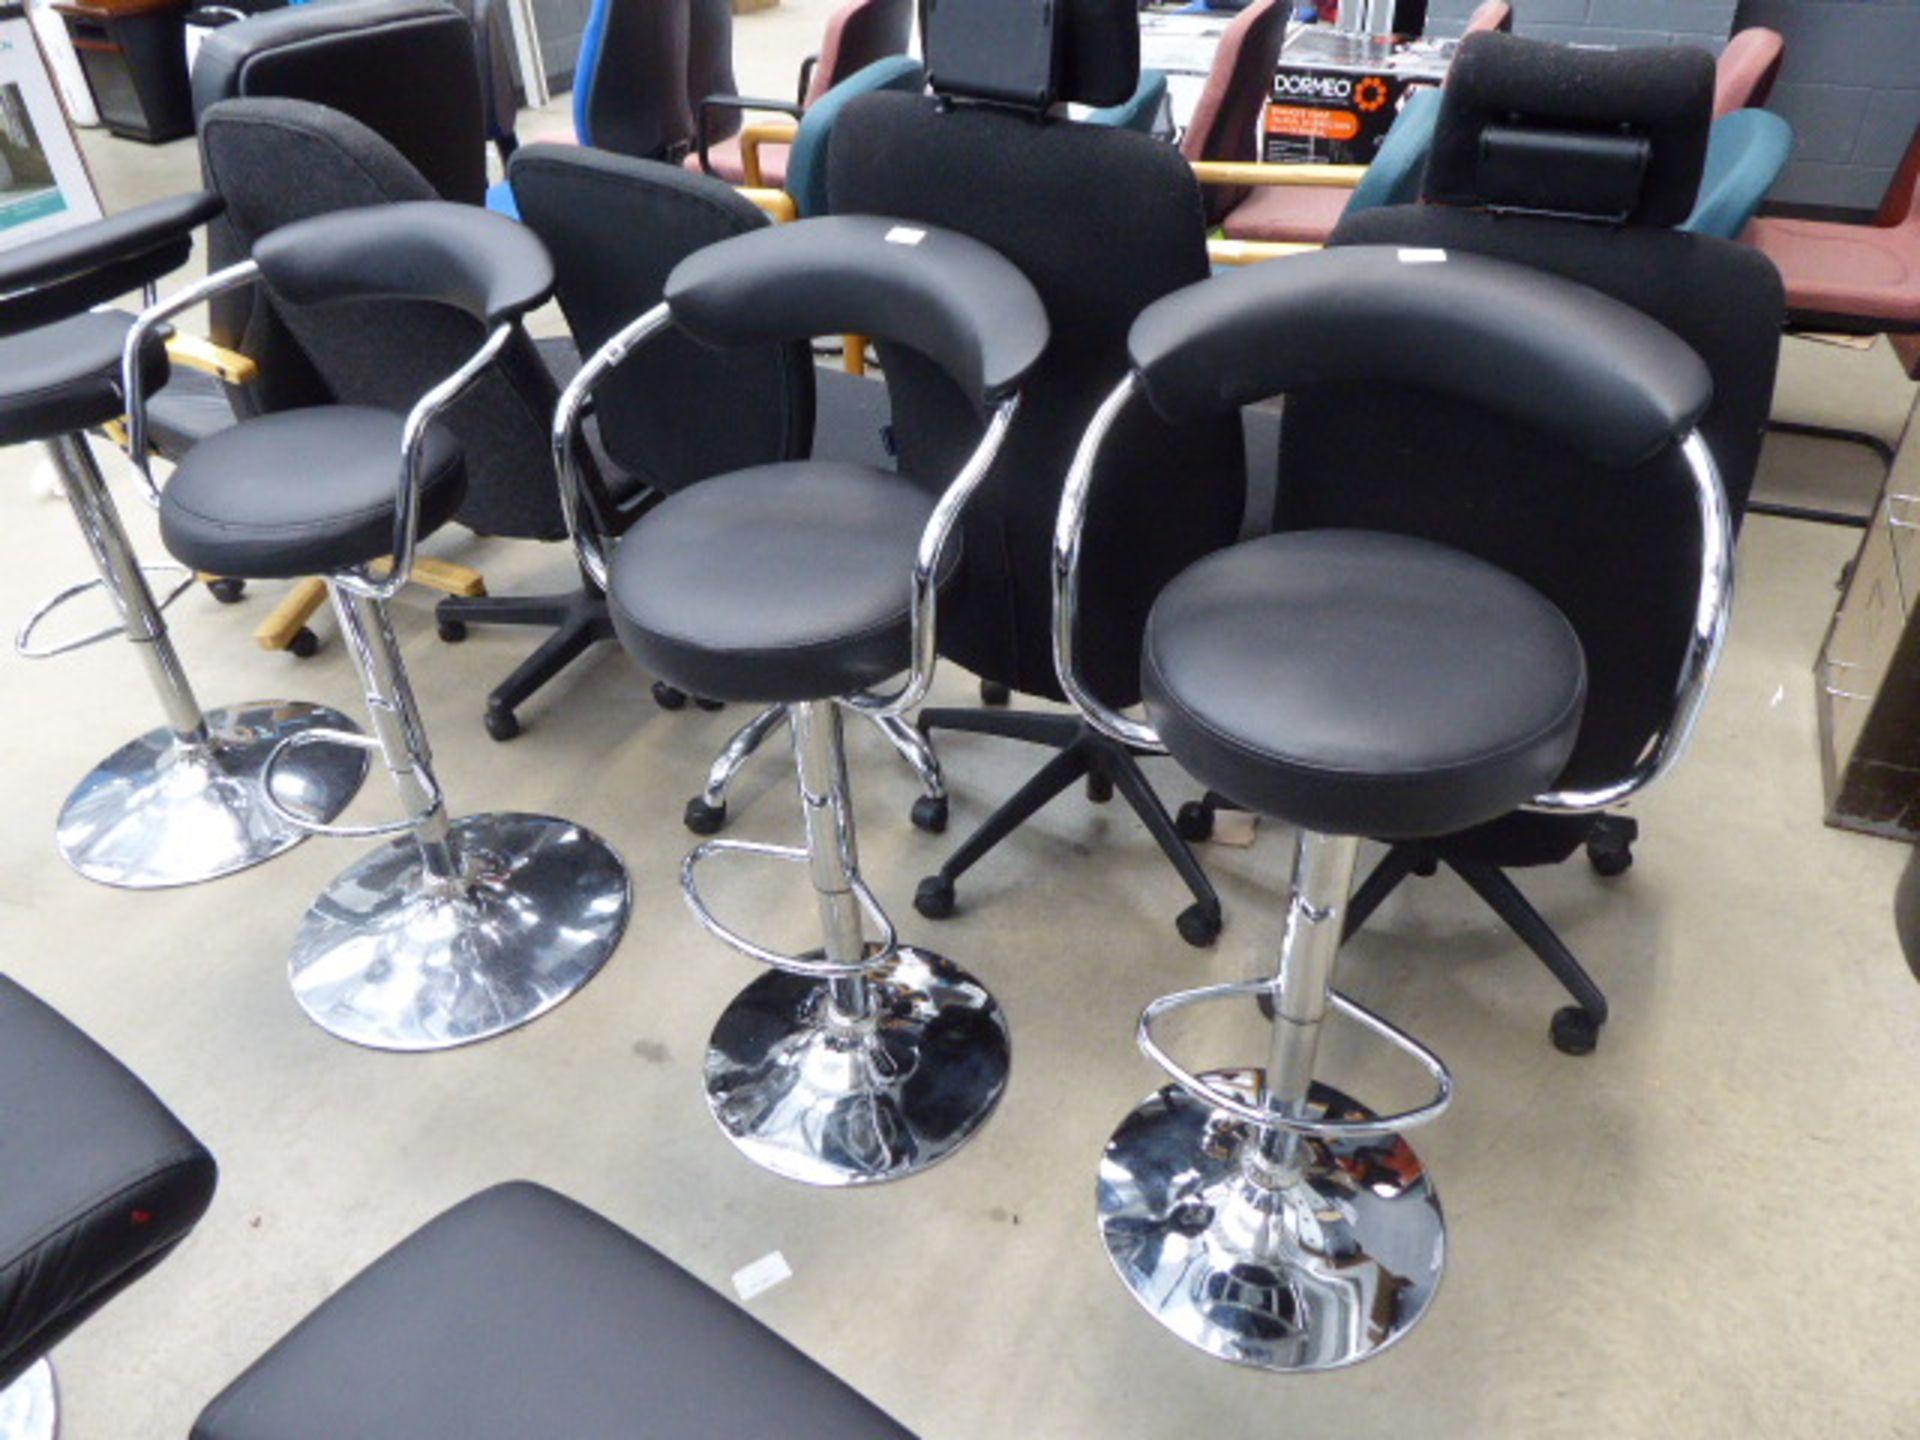 Lot 4248 - 2 black chrome based bar stools